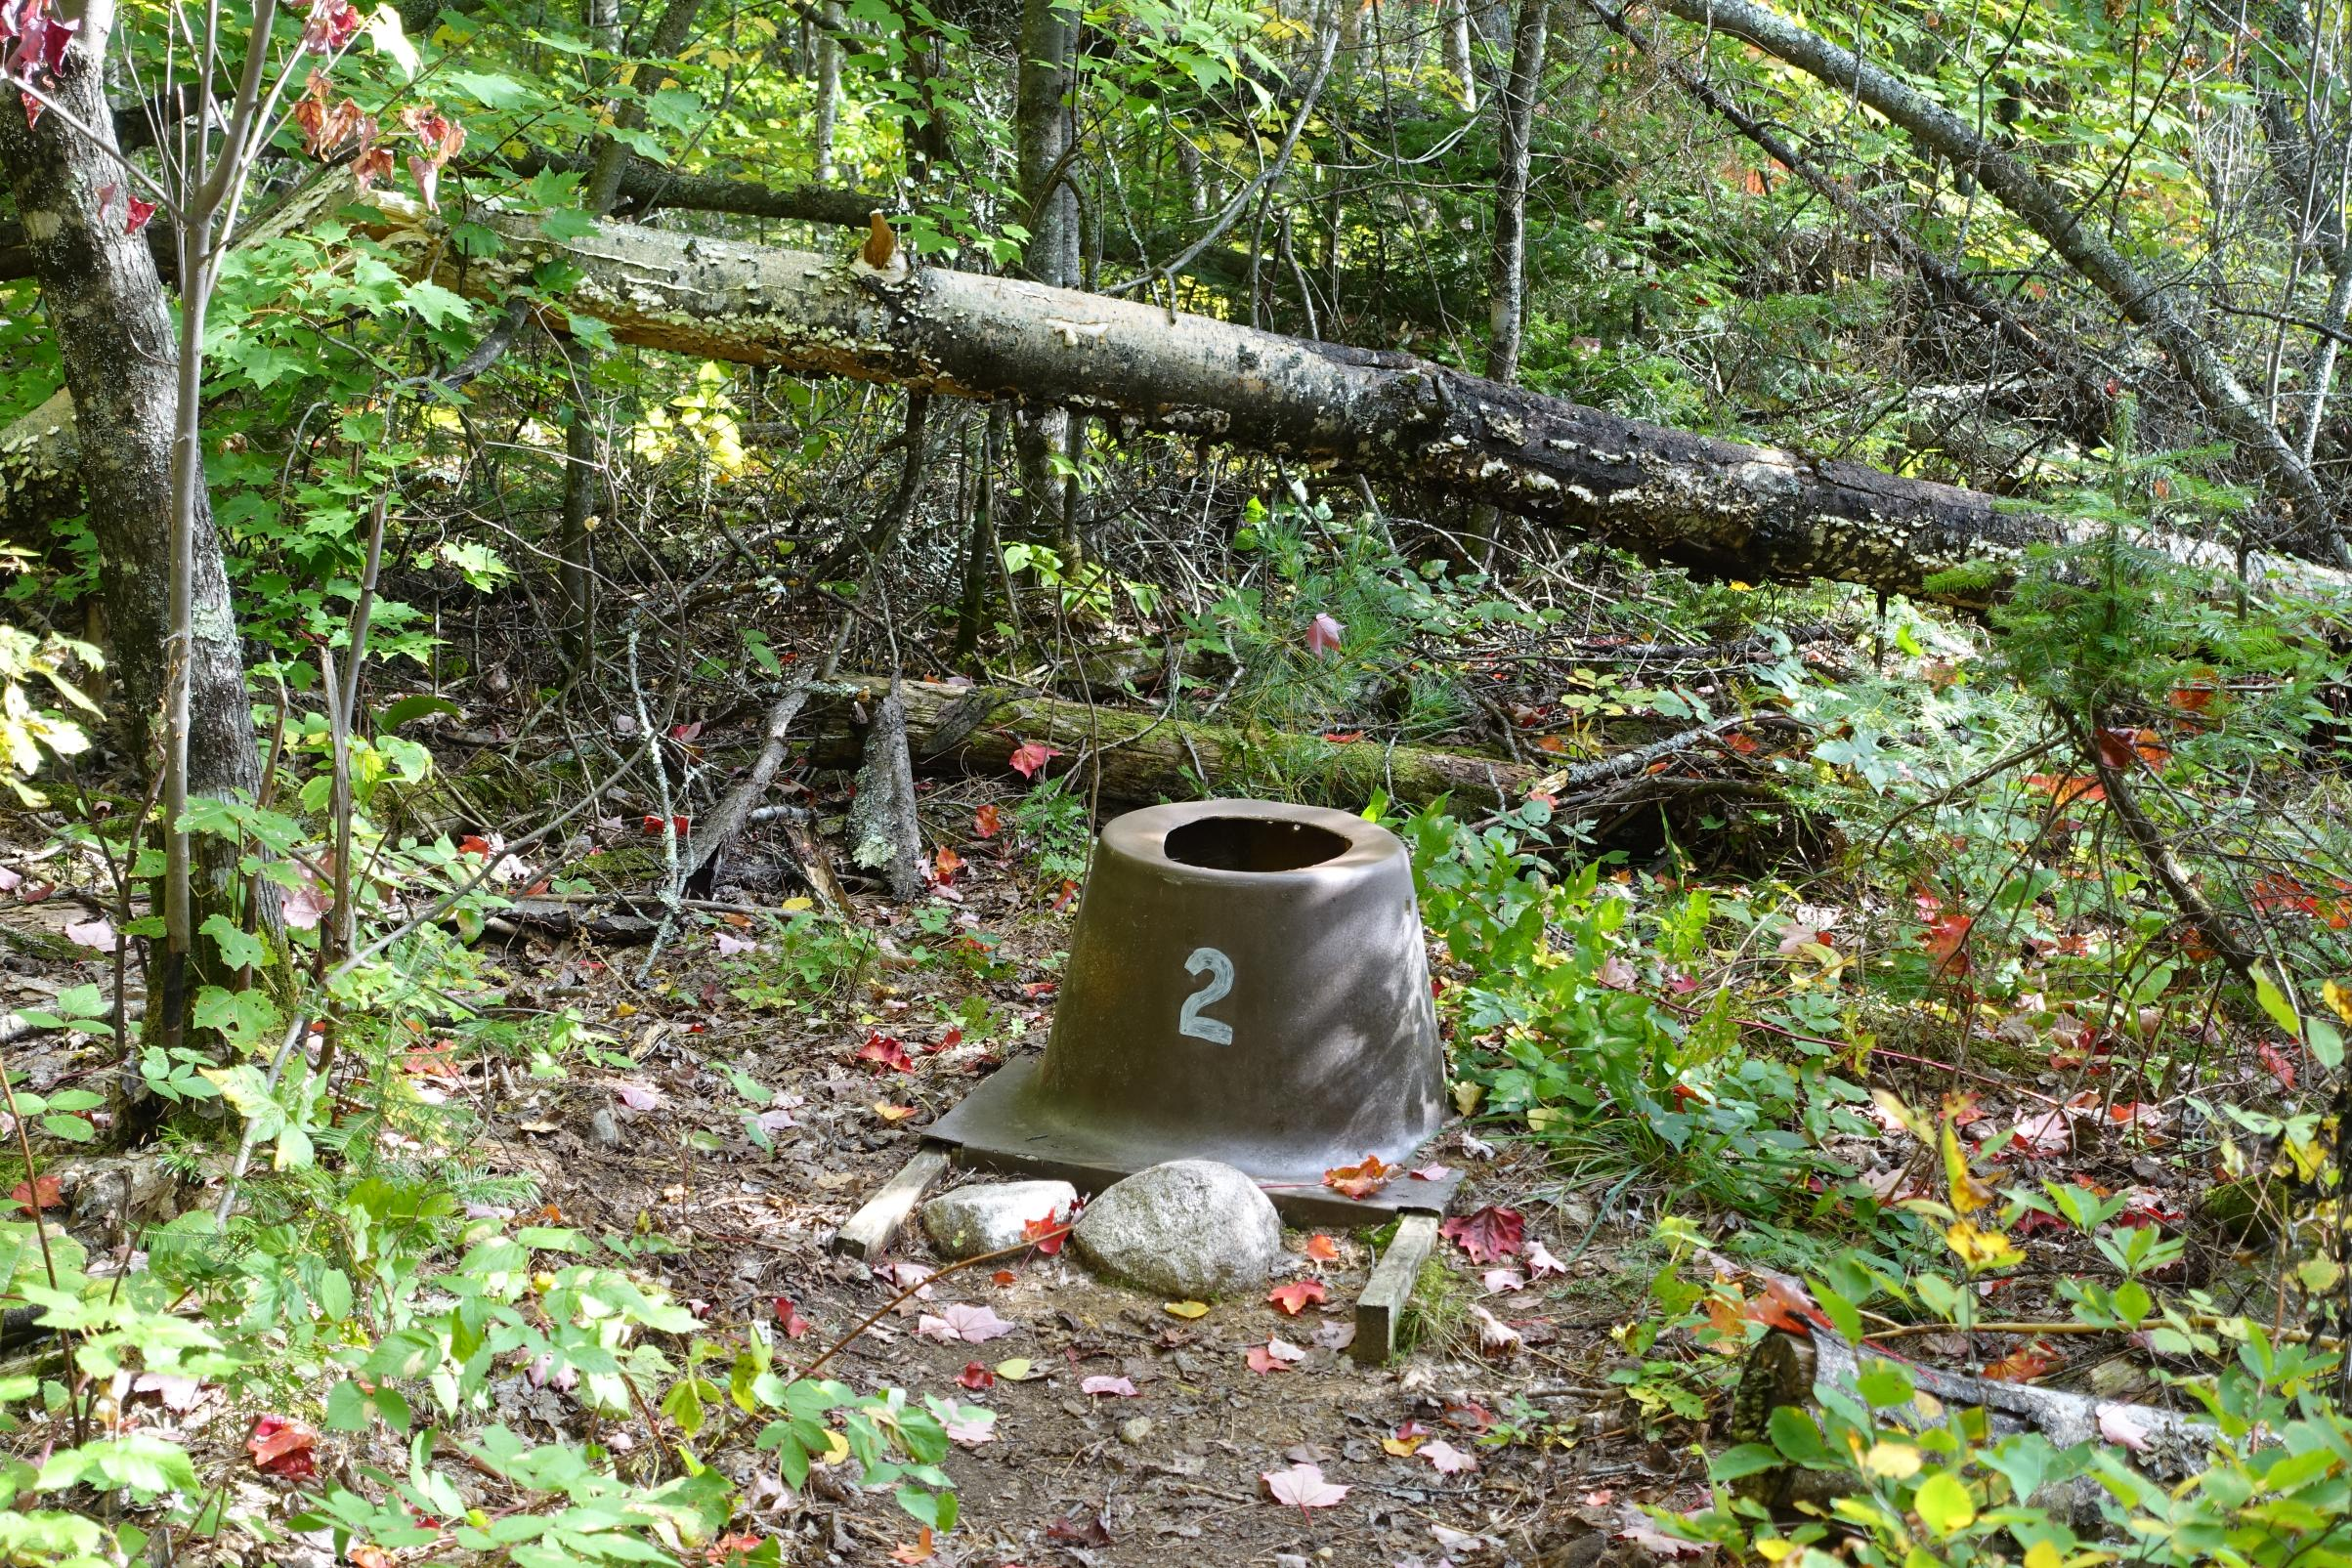 Camp Site #2